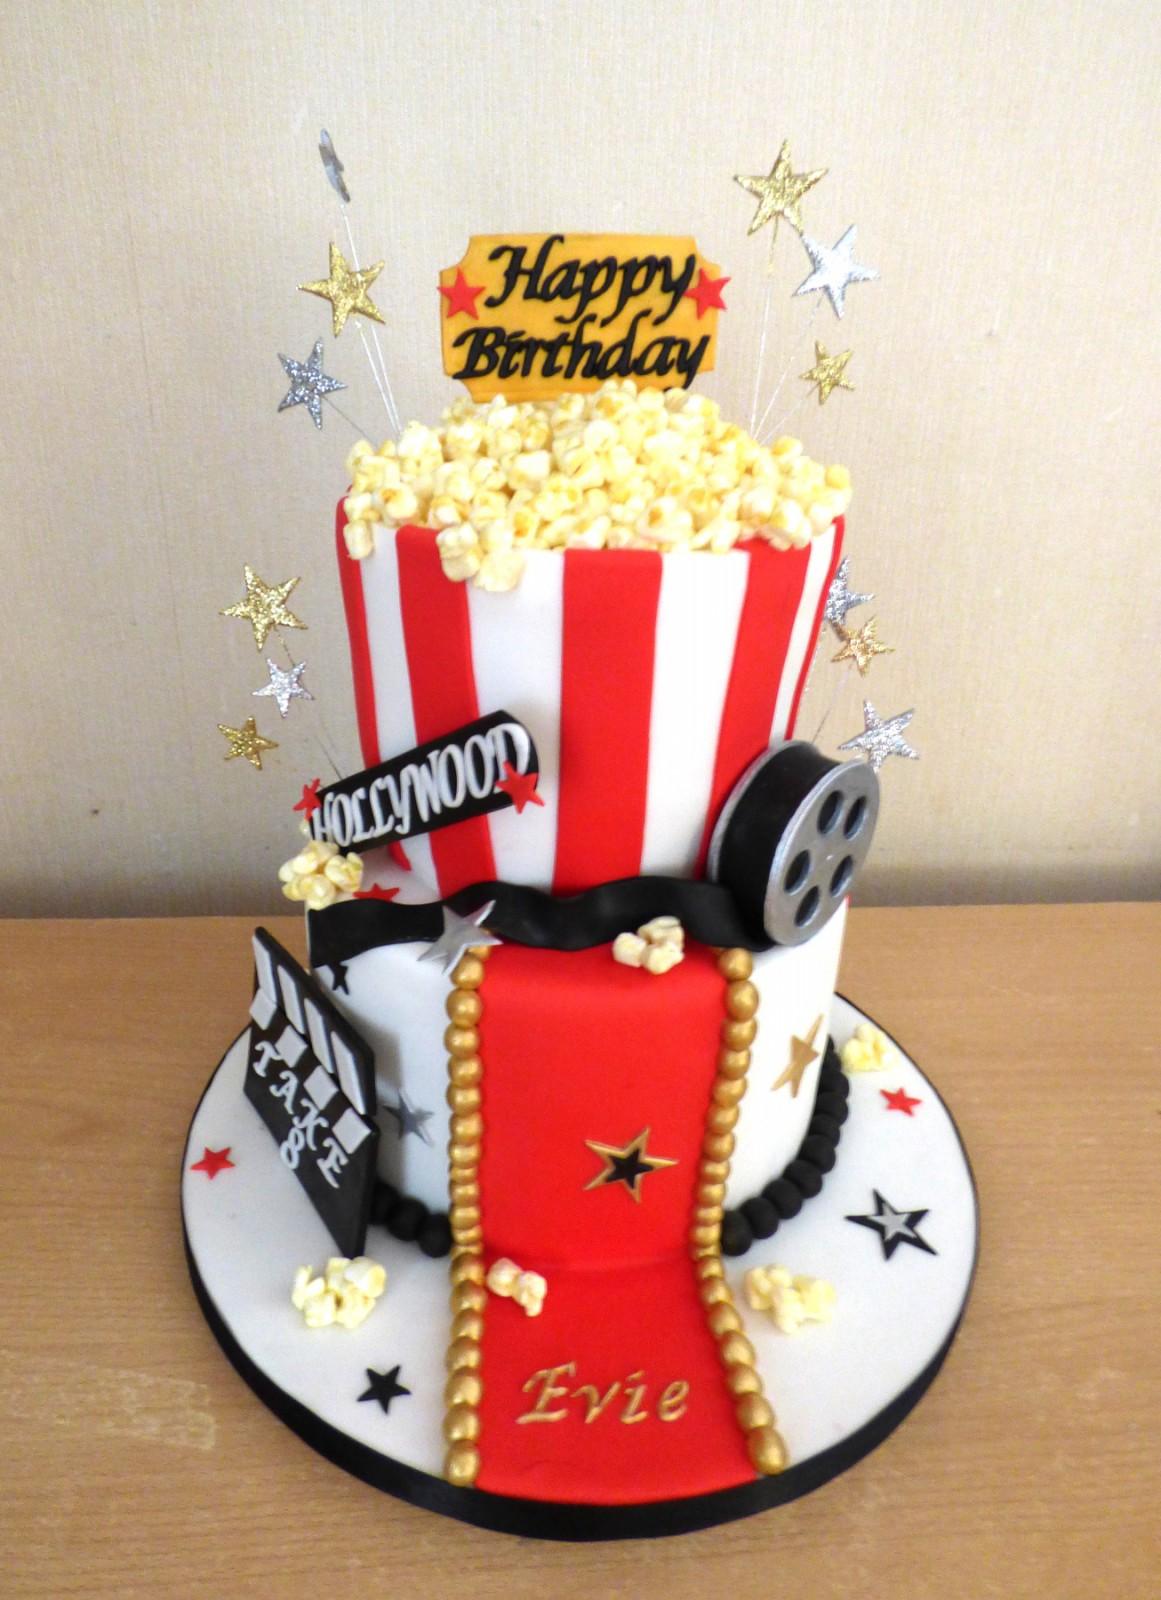 Astonishing 2 Tier Movie Themed Birthday Cake Susies Cakes Funny Birthday Cards Online Alyptdamsfinfo